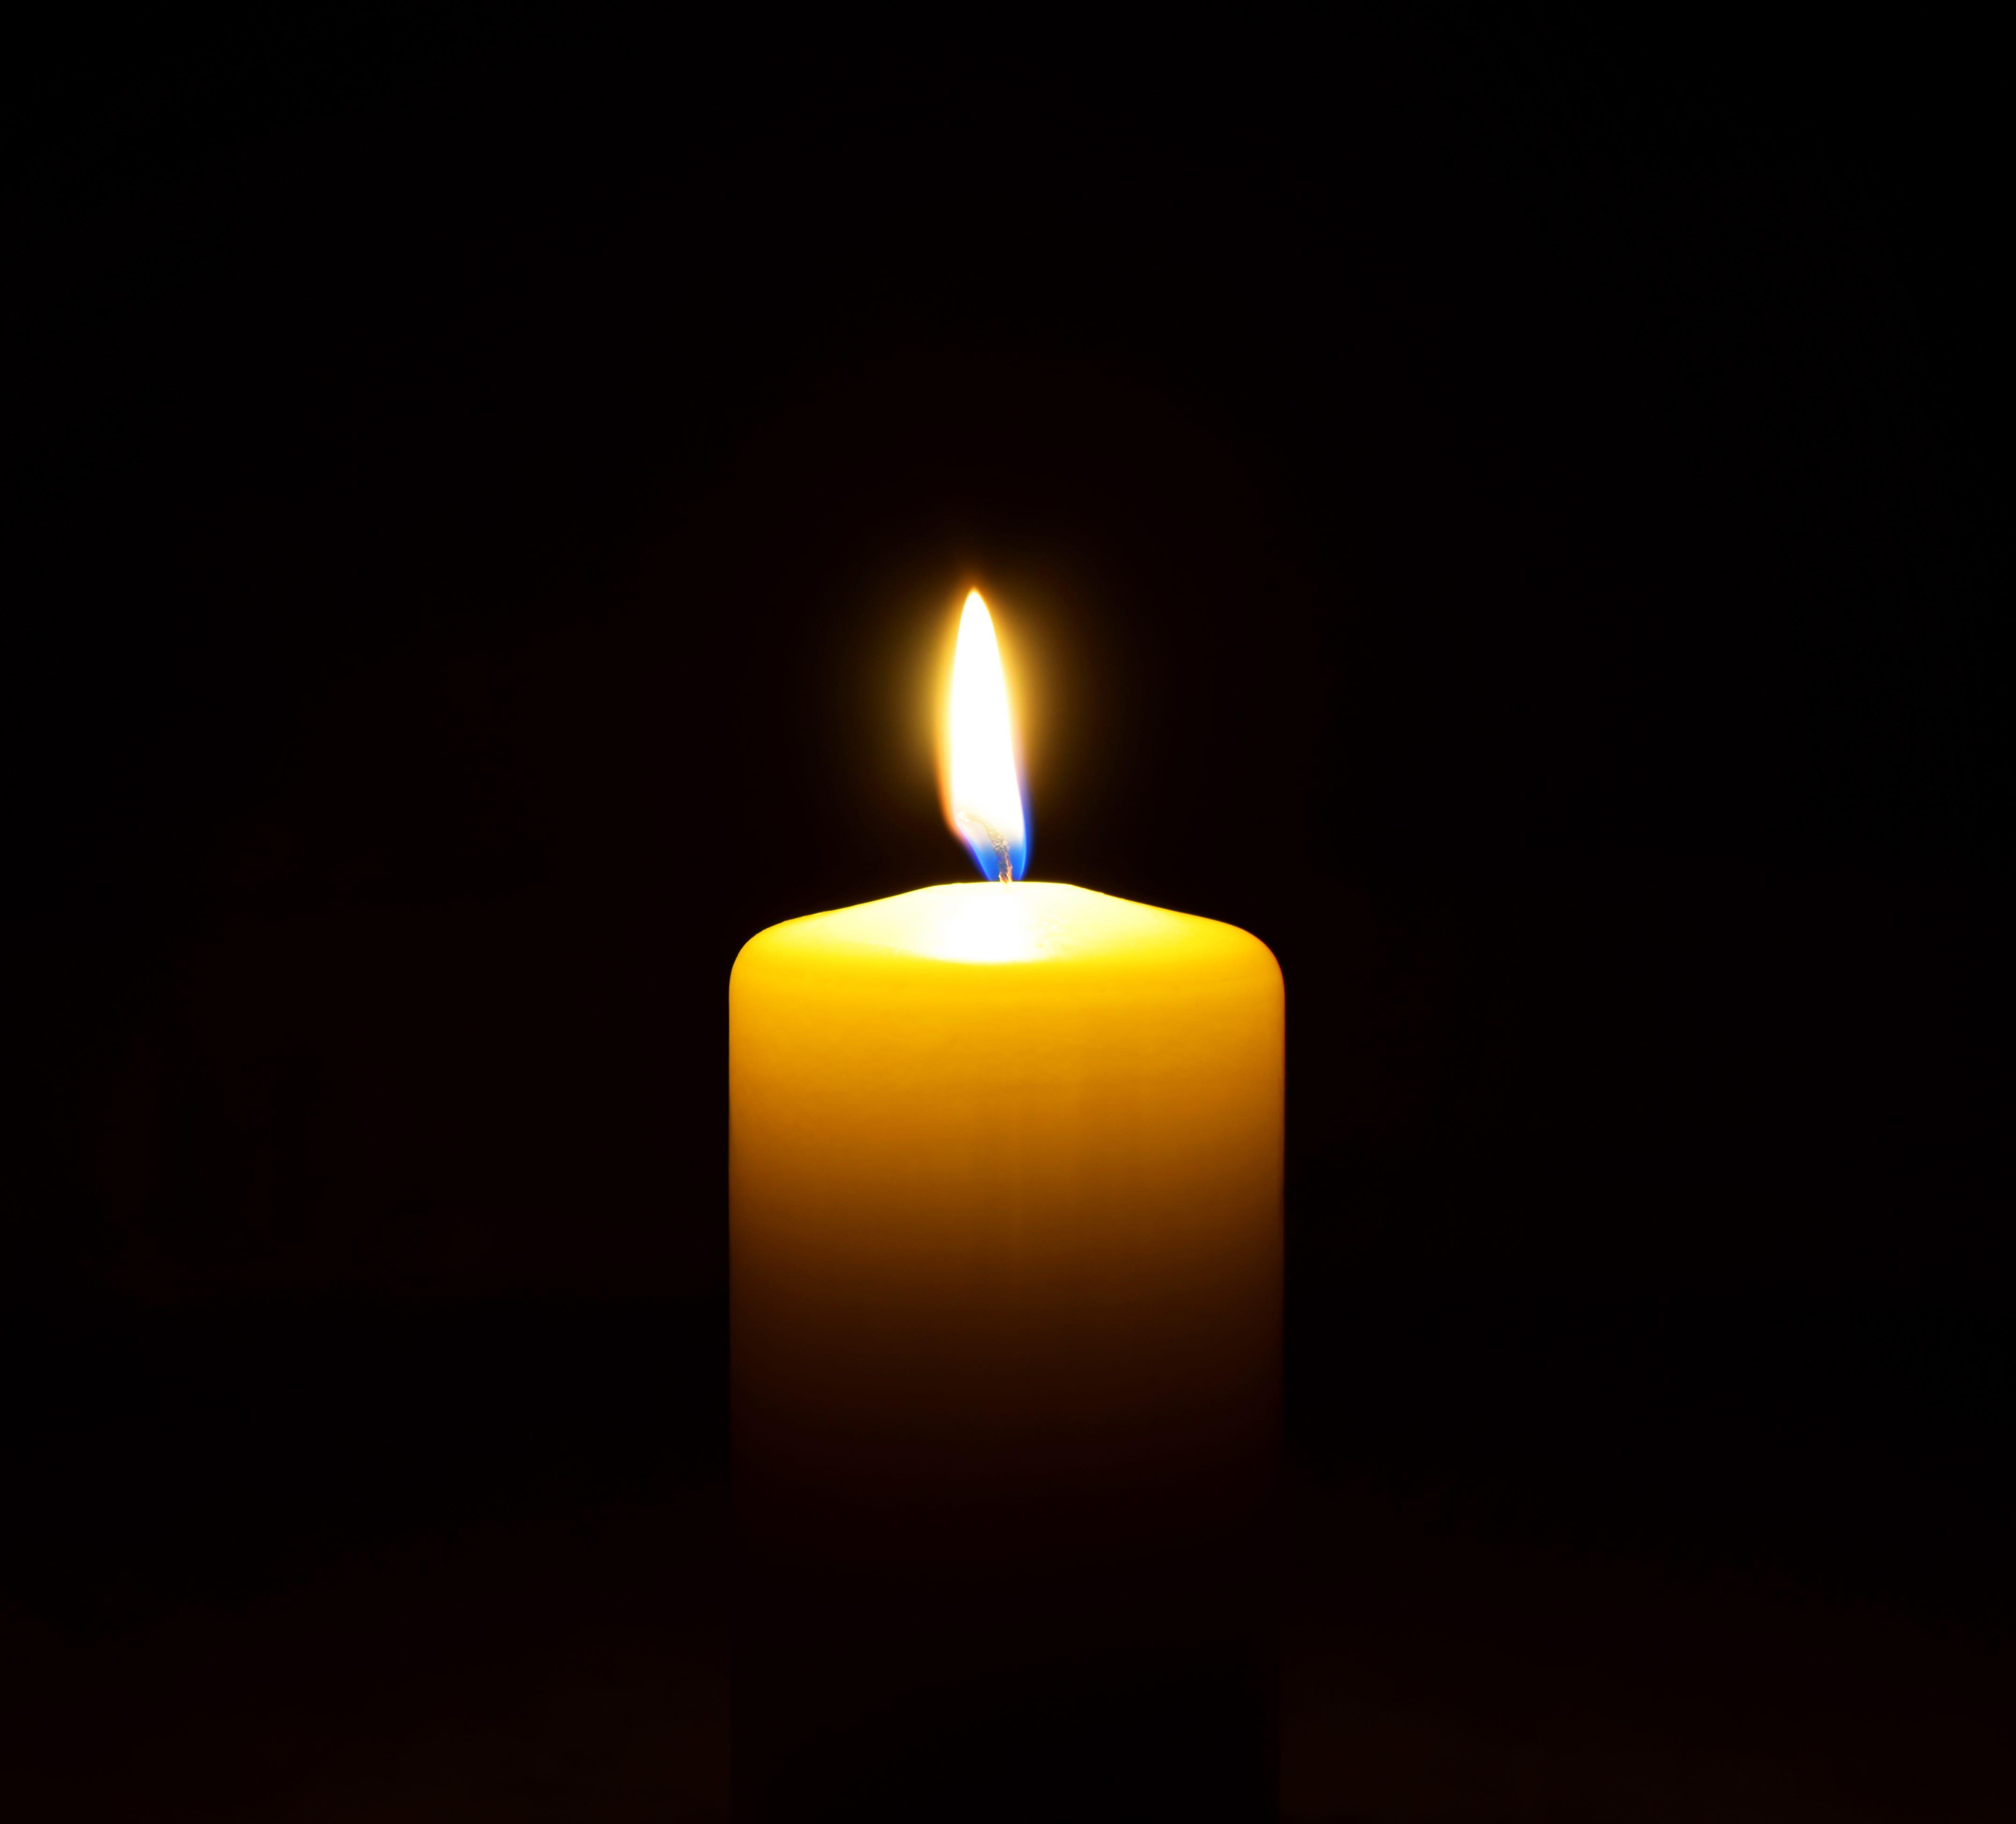 Maylia Meija, 7, was killed in a car wreck on Feb. 17, 2019.